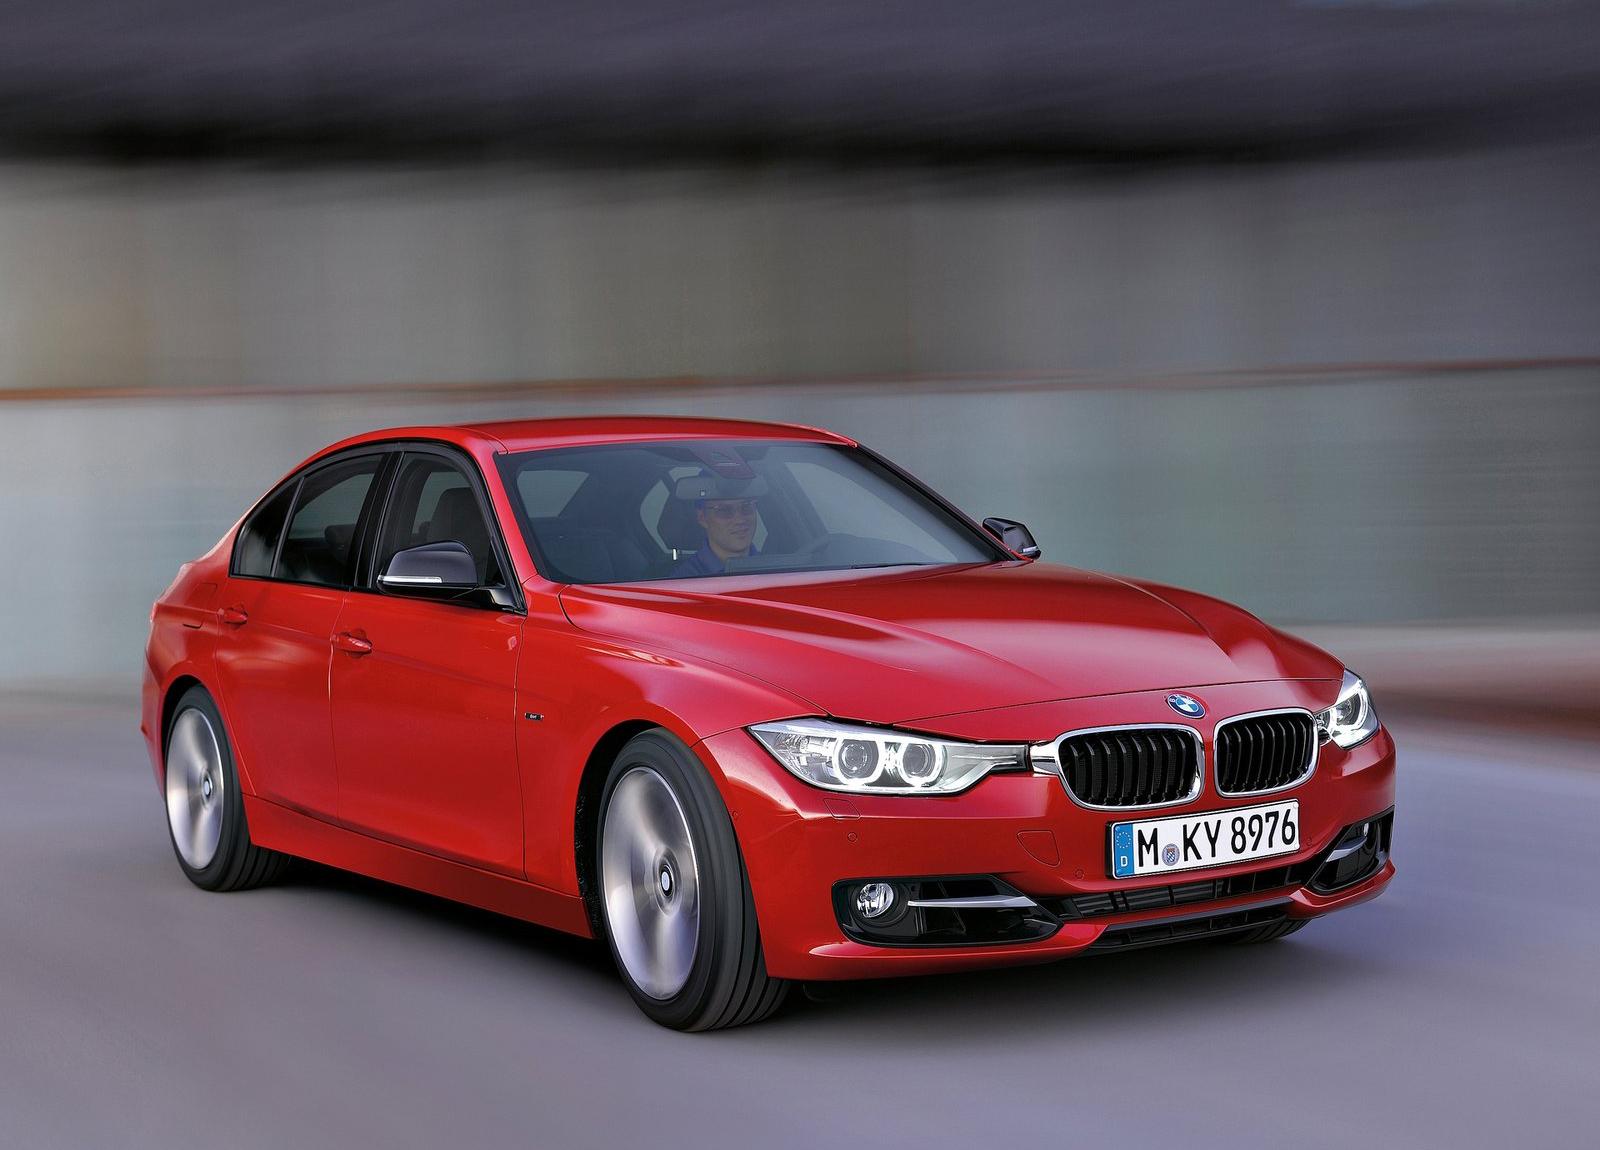 http://3.bp.blogspot.com/-brUQkhweCsI/UCpzZA5u80I/AAAAAAAAHE4/ZvhI9NDaPMA/s1600/BMW-3-Series_2012_1600x1200_wallpaper_07.jpg